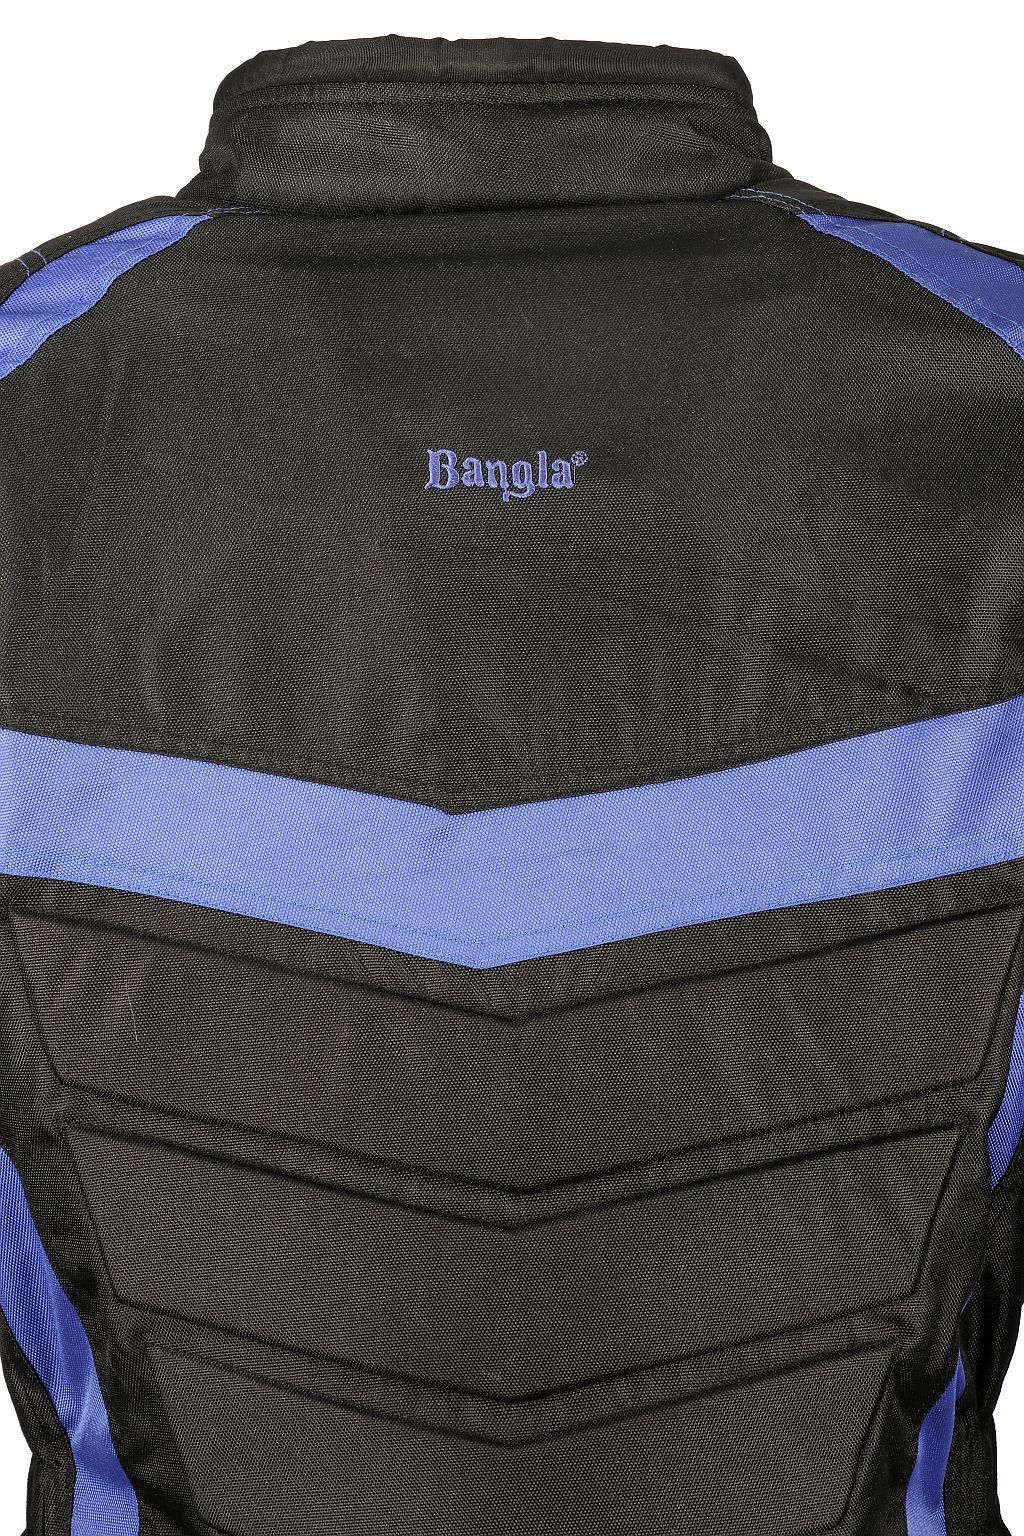 Bangla Motorrad Textil Kinder Jacke Cordura schwarz blau Motorradjacke 128 - 176